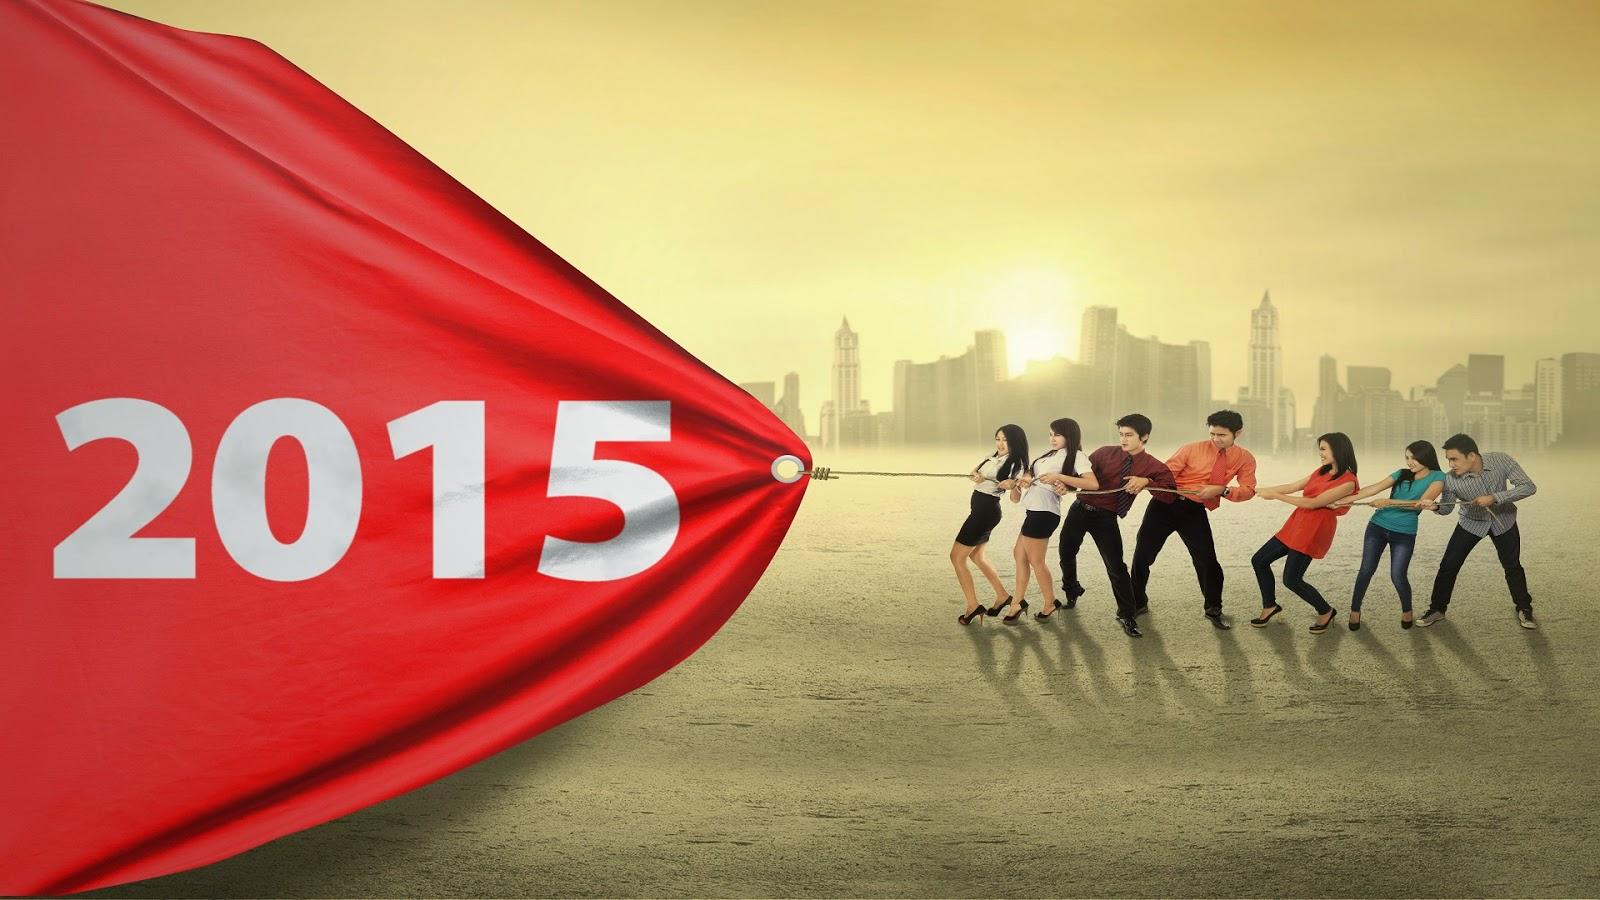 Happy New Year 2015 HD Desktop Background Wallpaper – 1366×768 (16 ...